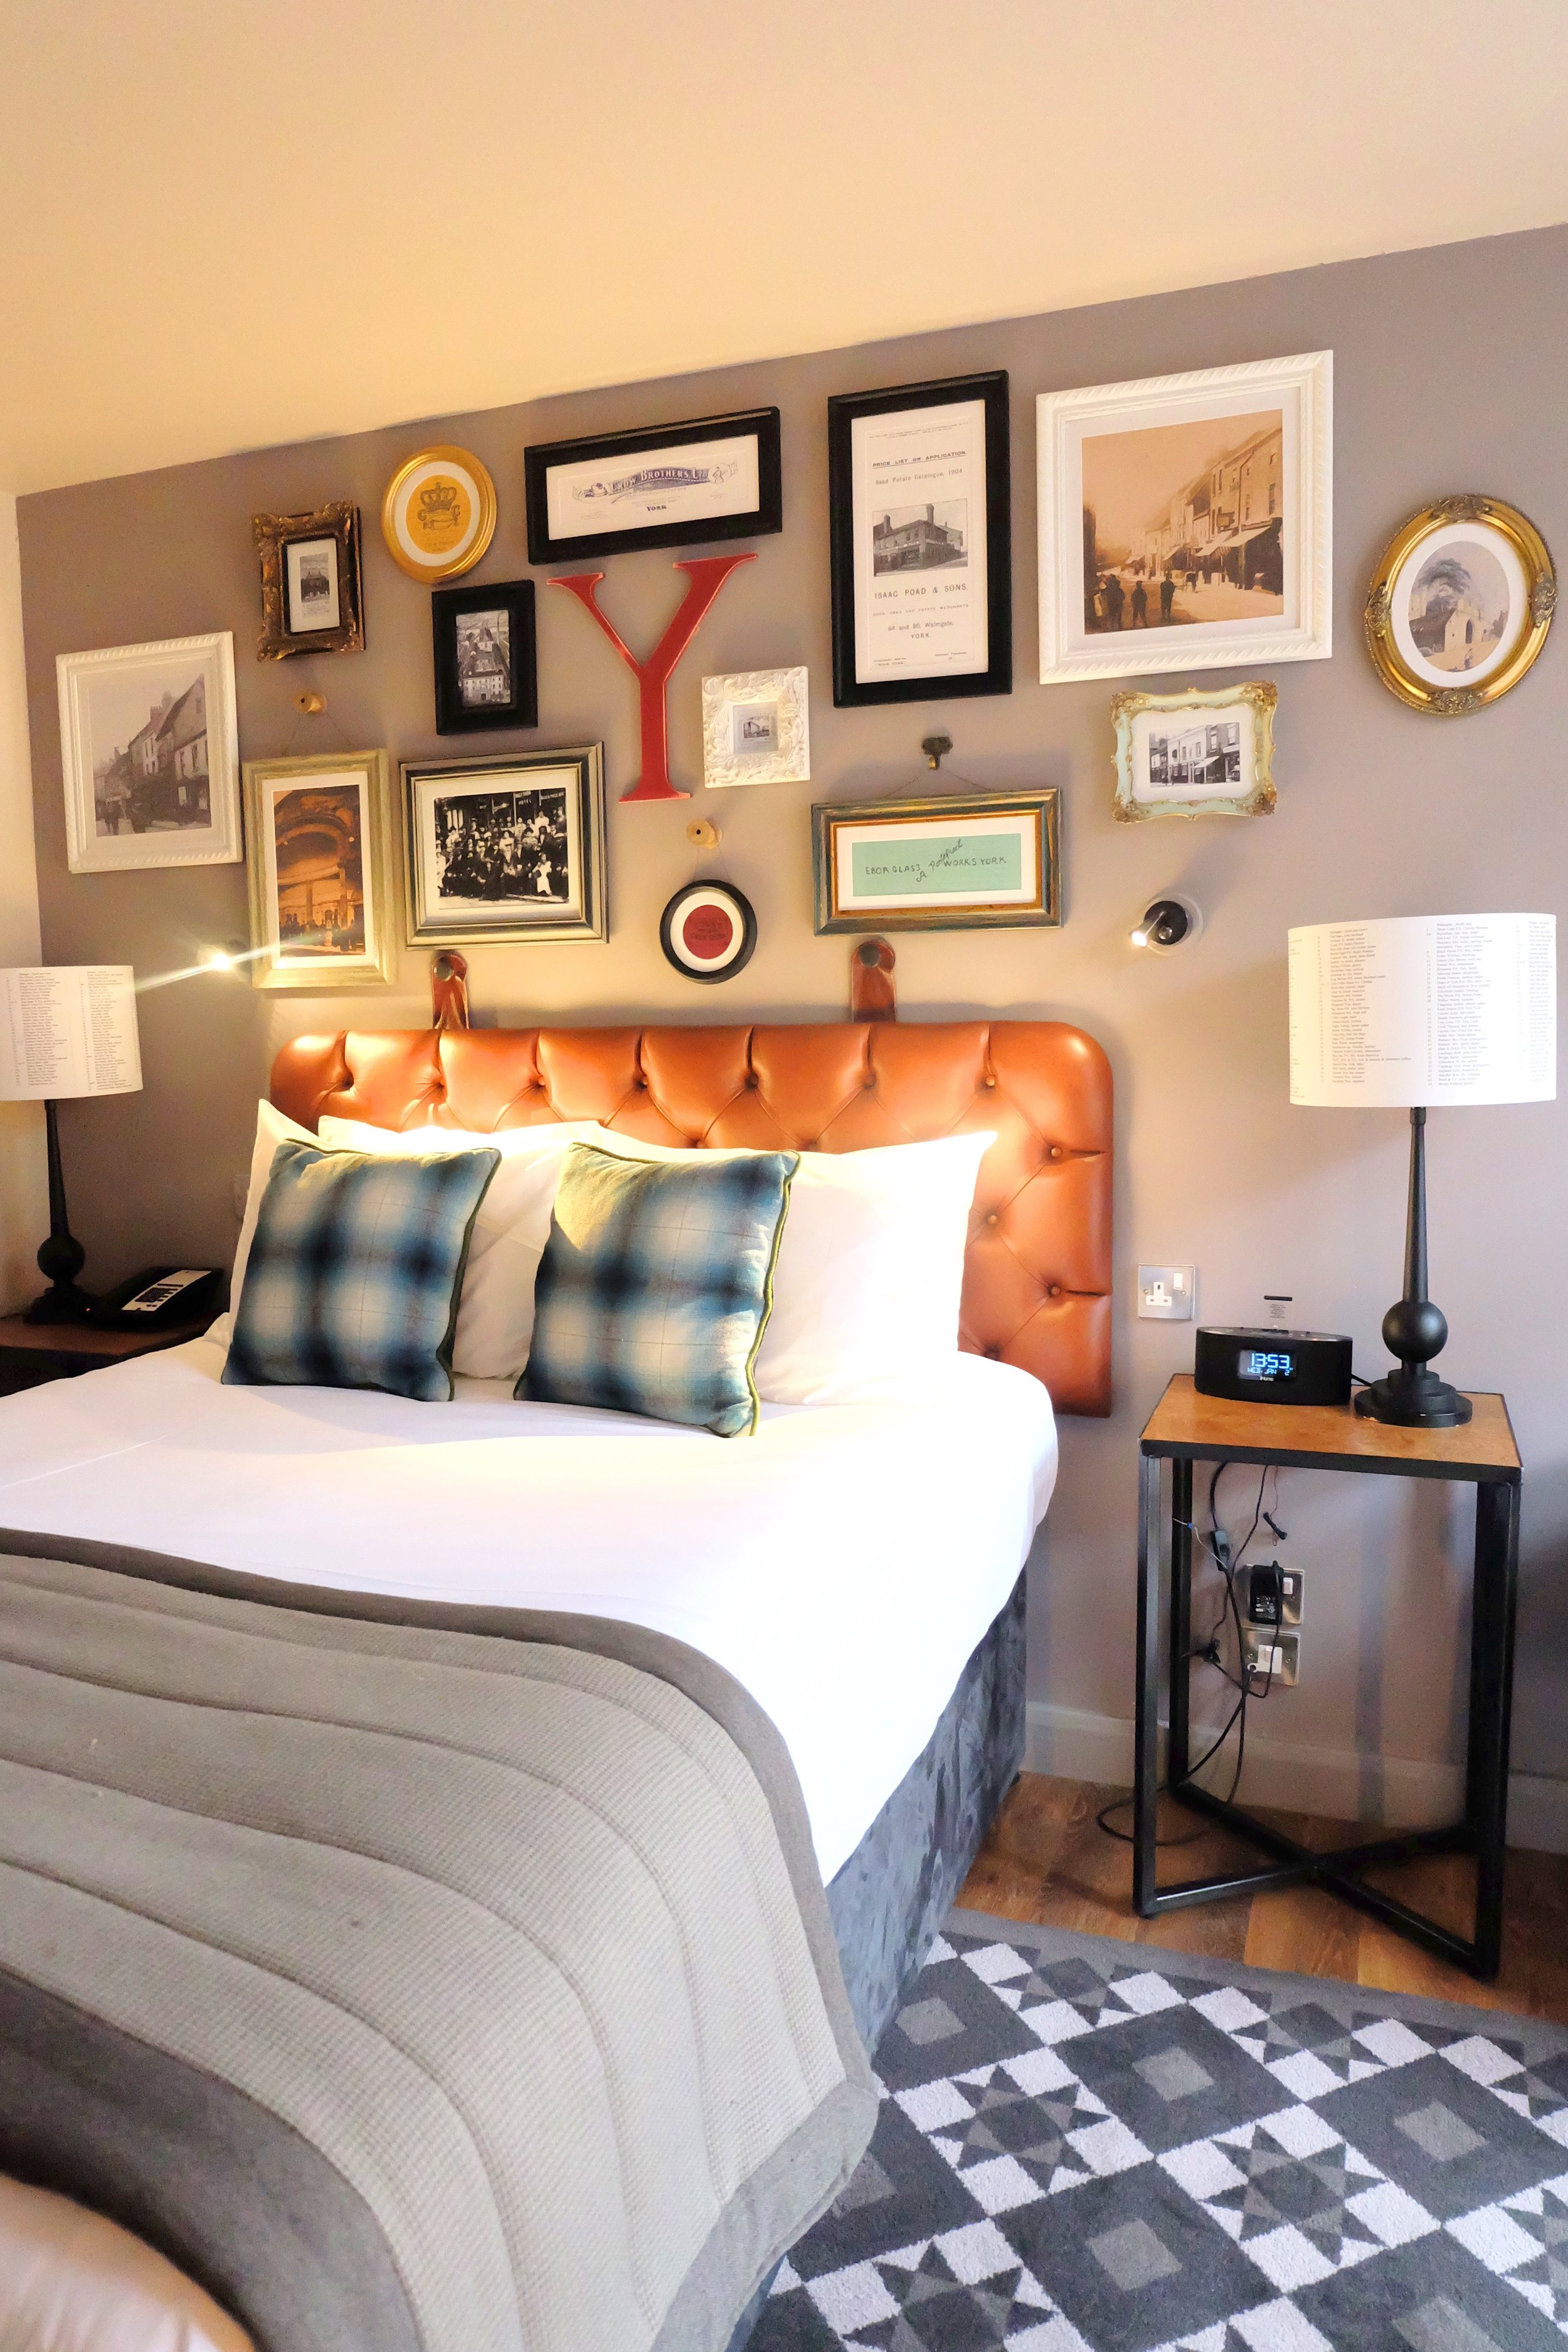 Bedroom at Hotel Indigo York